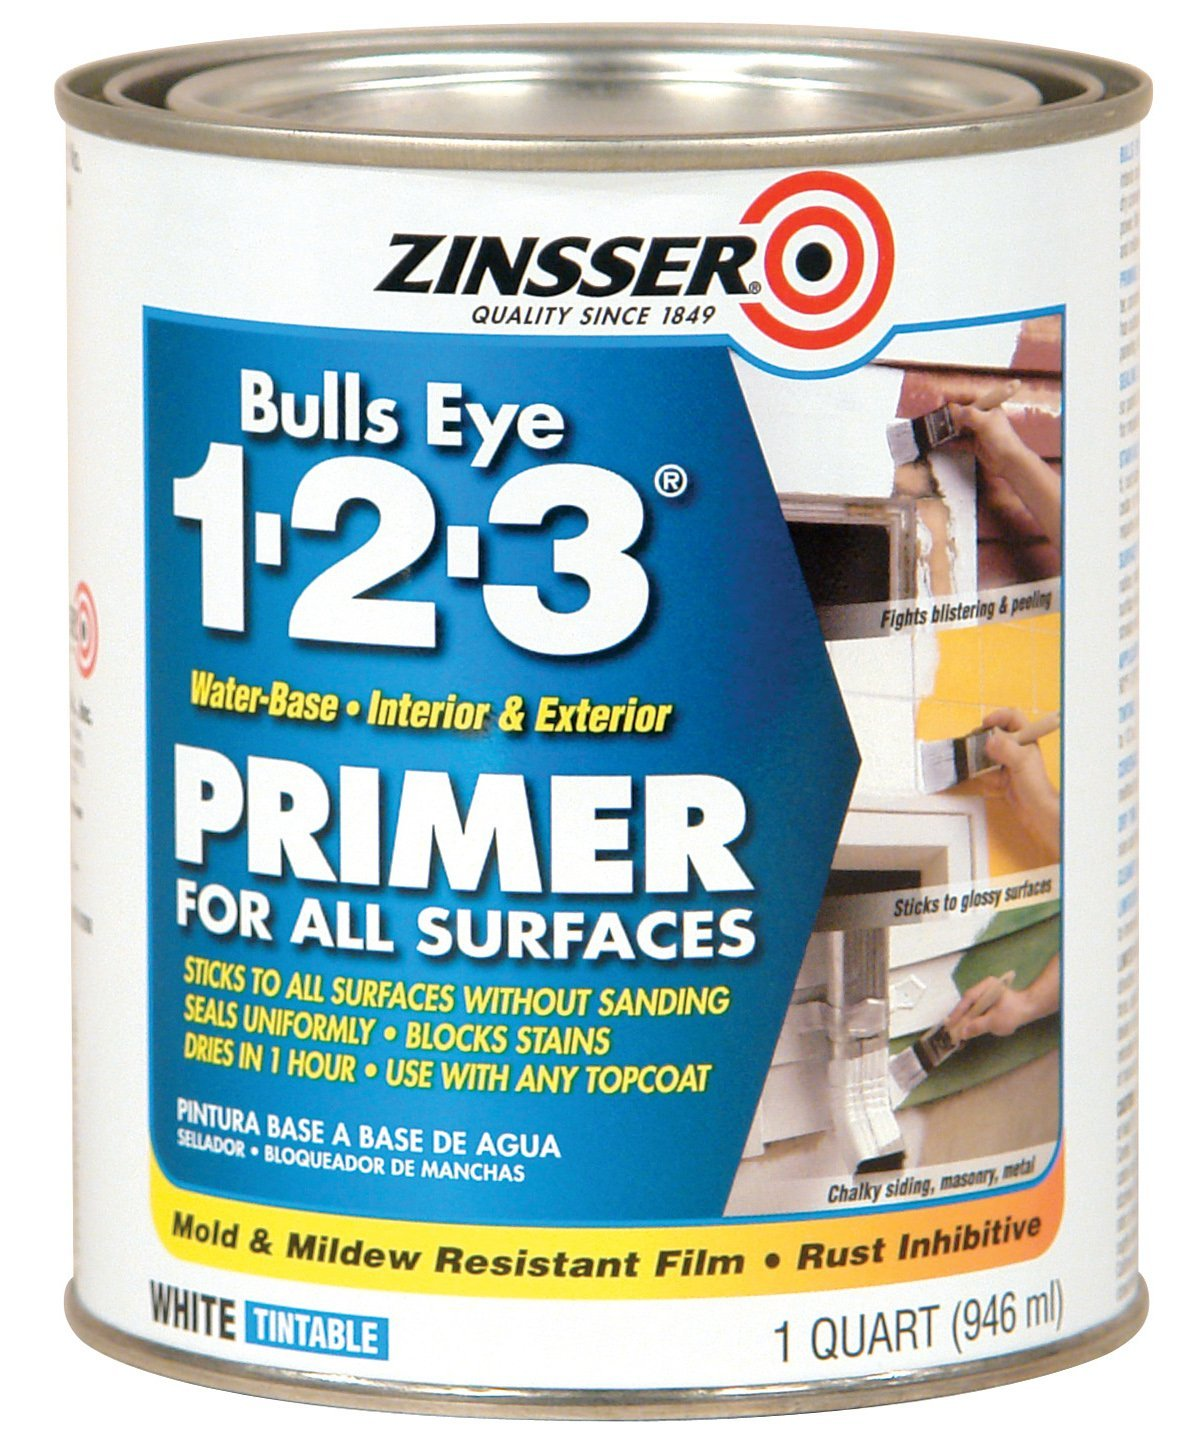 Types of Paint: Zinsser Primer